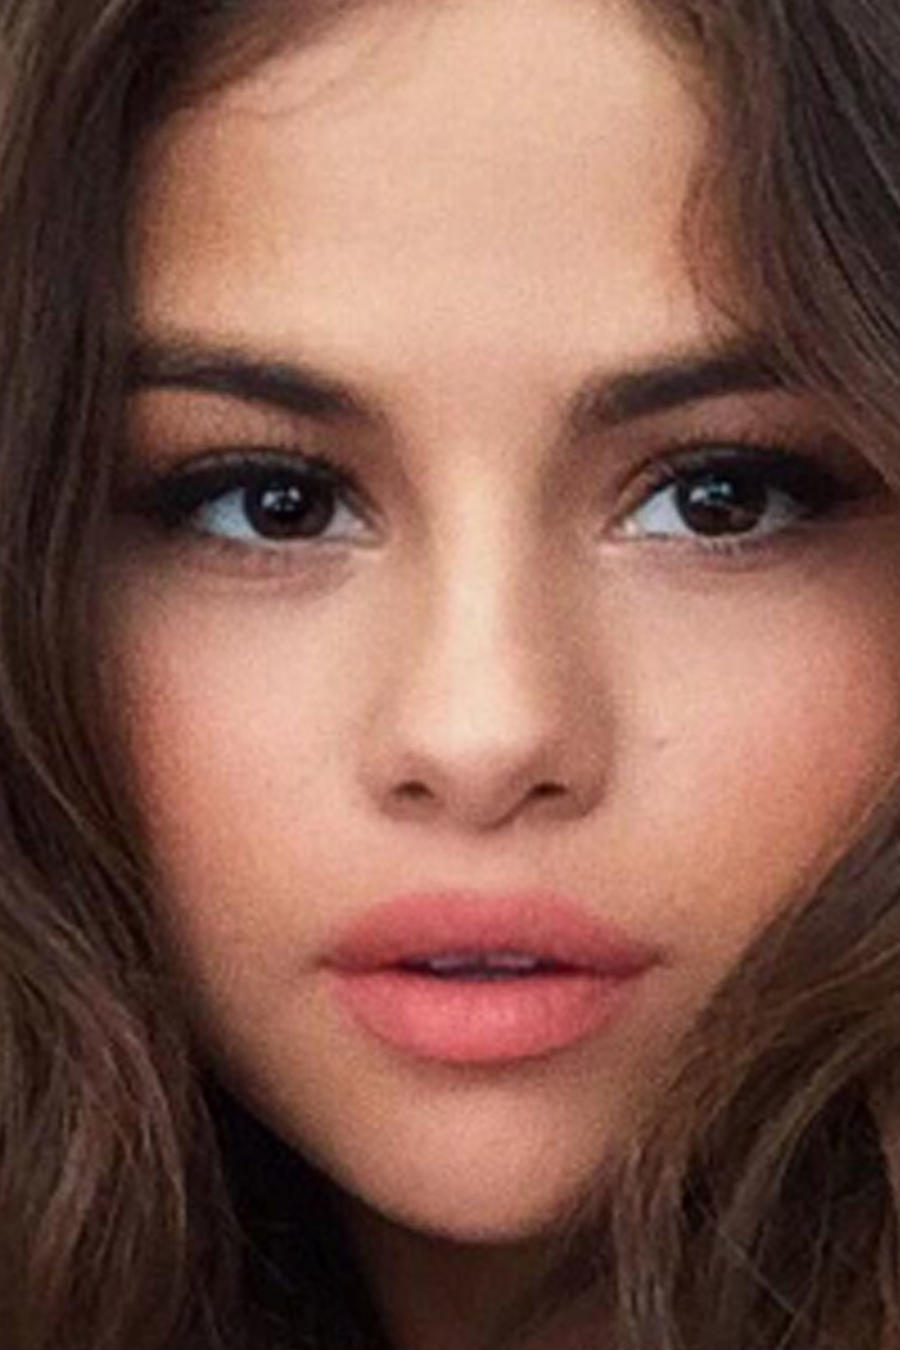 Selena Gomez selfie